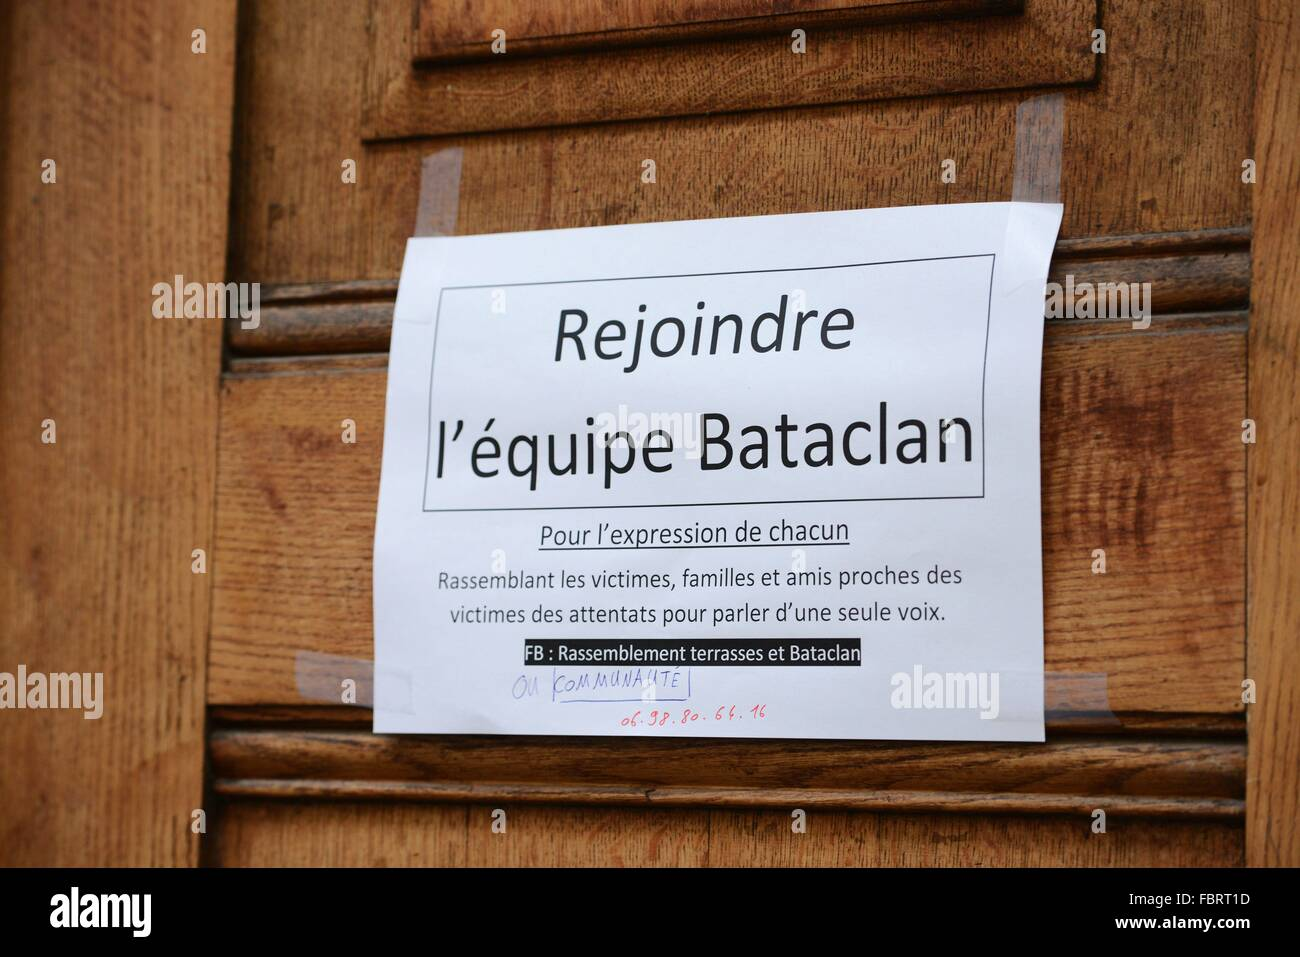 Konzerthauses Bataclan in Paris in Paris, Dec.12, 2015. Stockbild